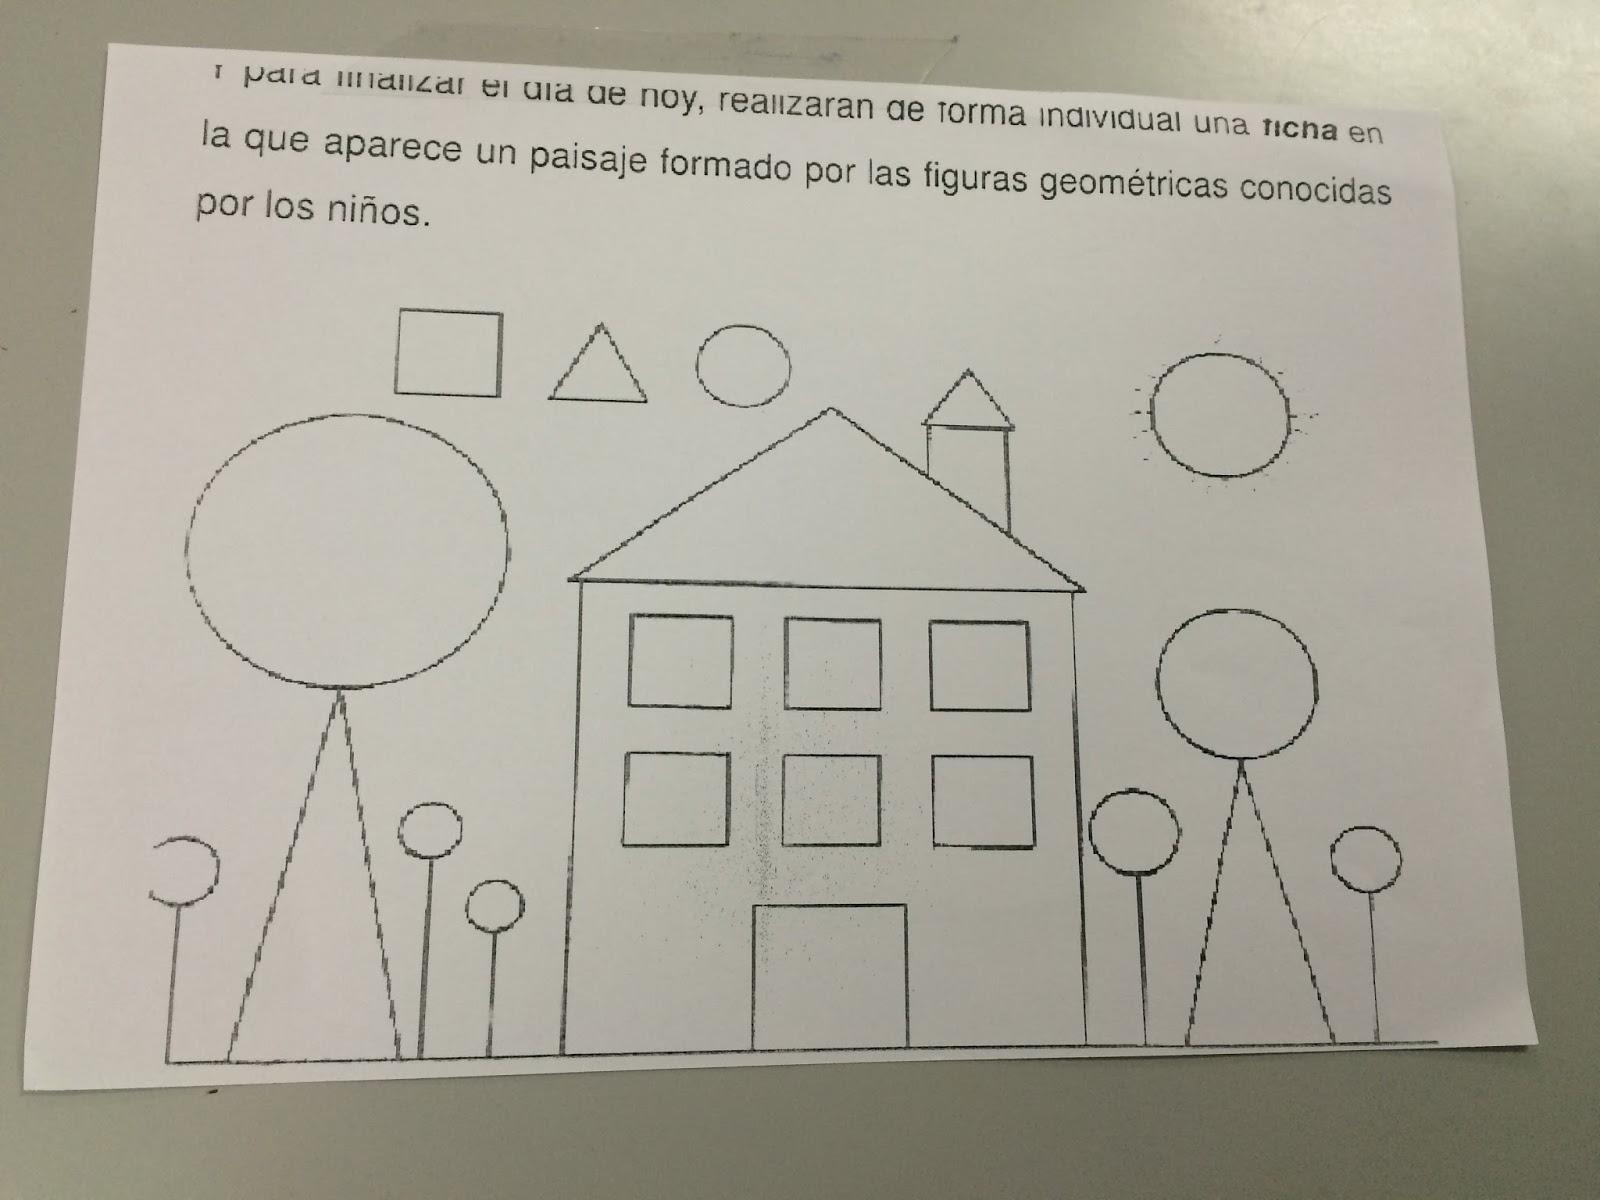 INFORMTICA JEREZ trabajamos las figuras geomtricas